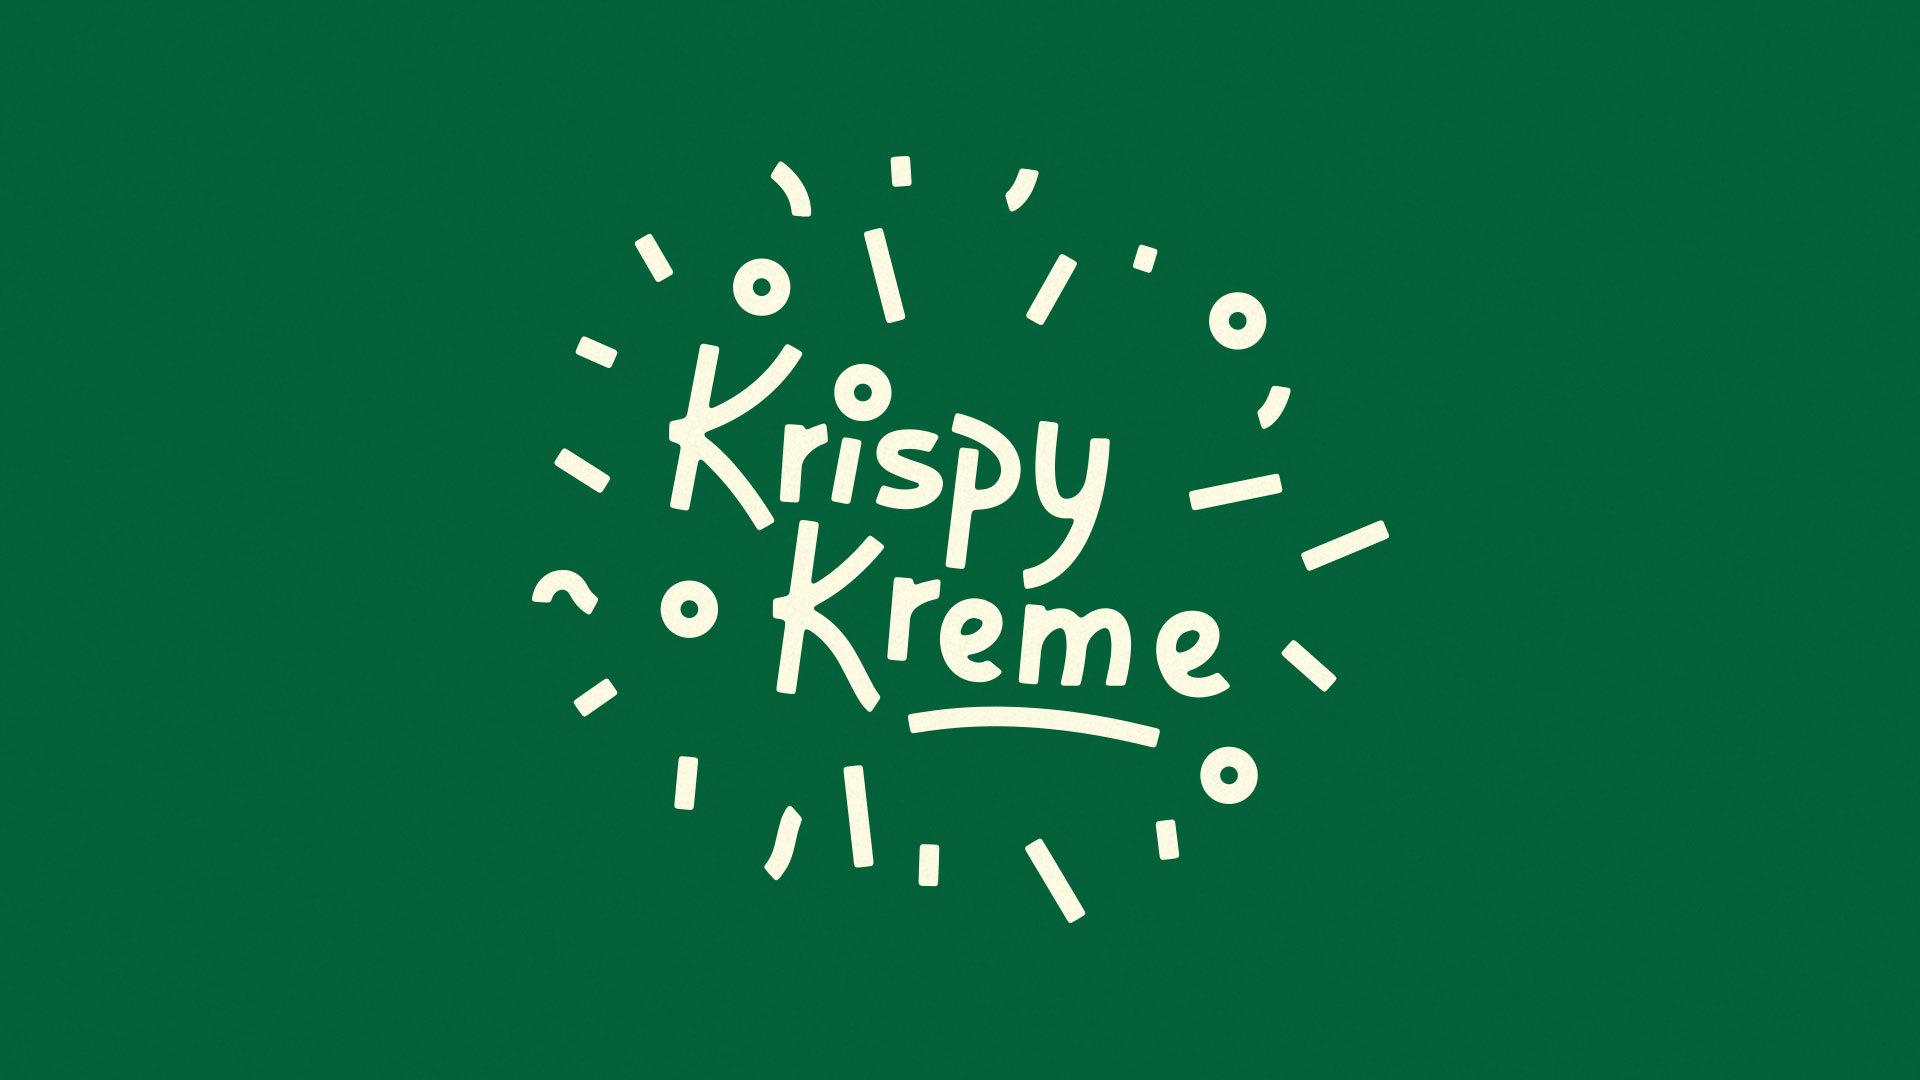 Krispykreme Sprinkles